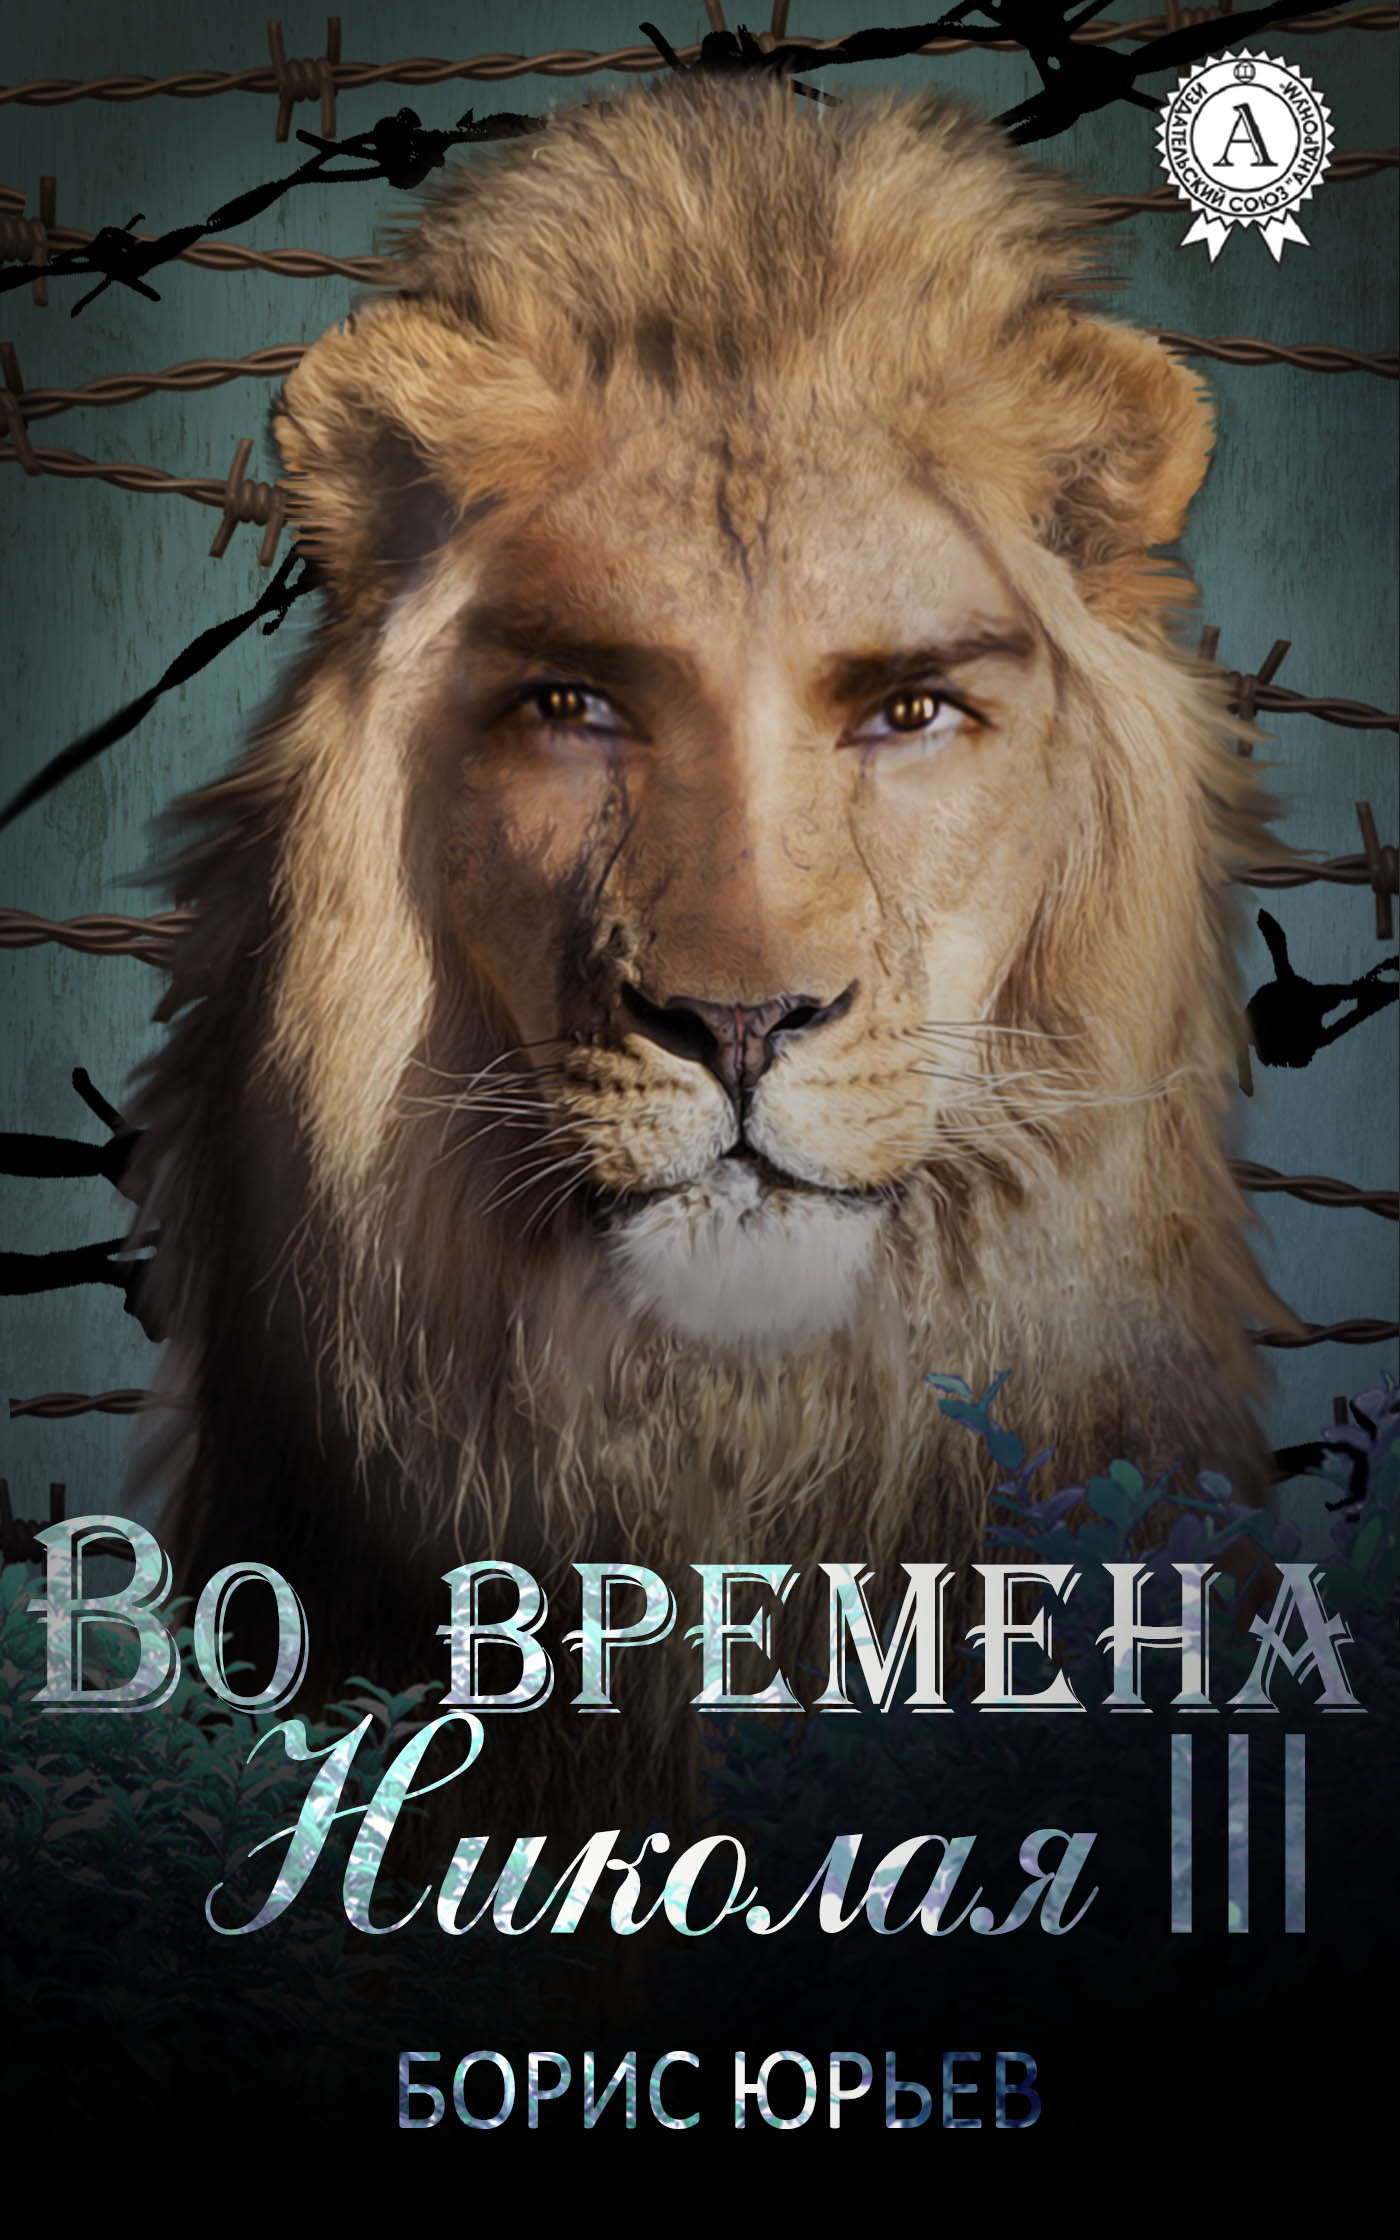 Борис Юрьев - Во времена Николая III